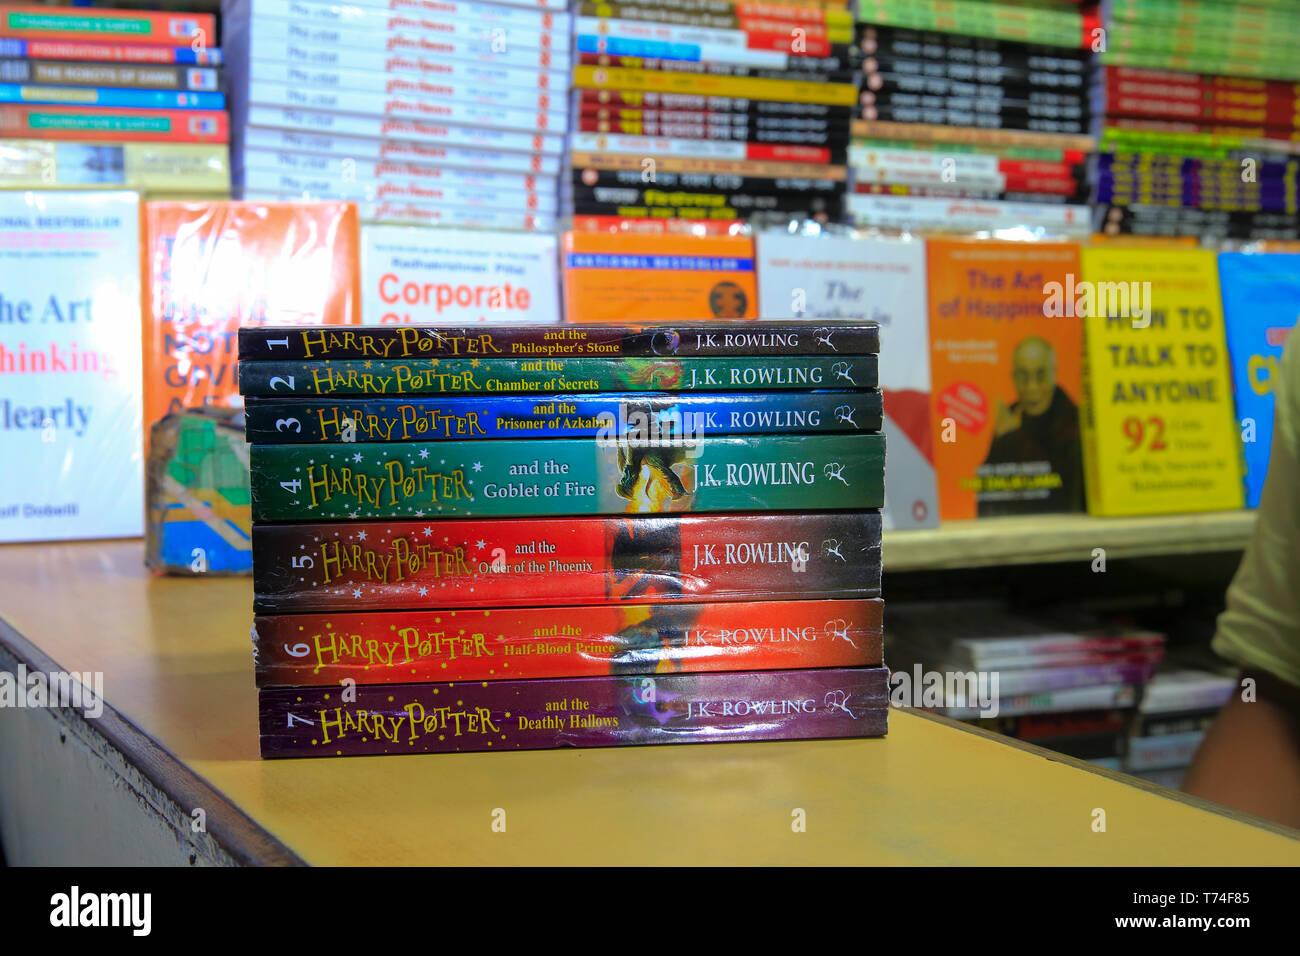 Bookshelf at a bookshop at Nilkhet Book Market. Dhaka, Bangladesh - Stock Image